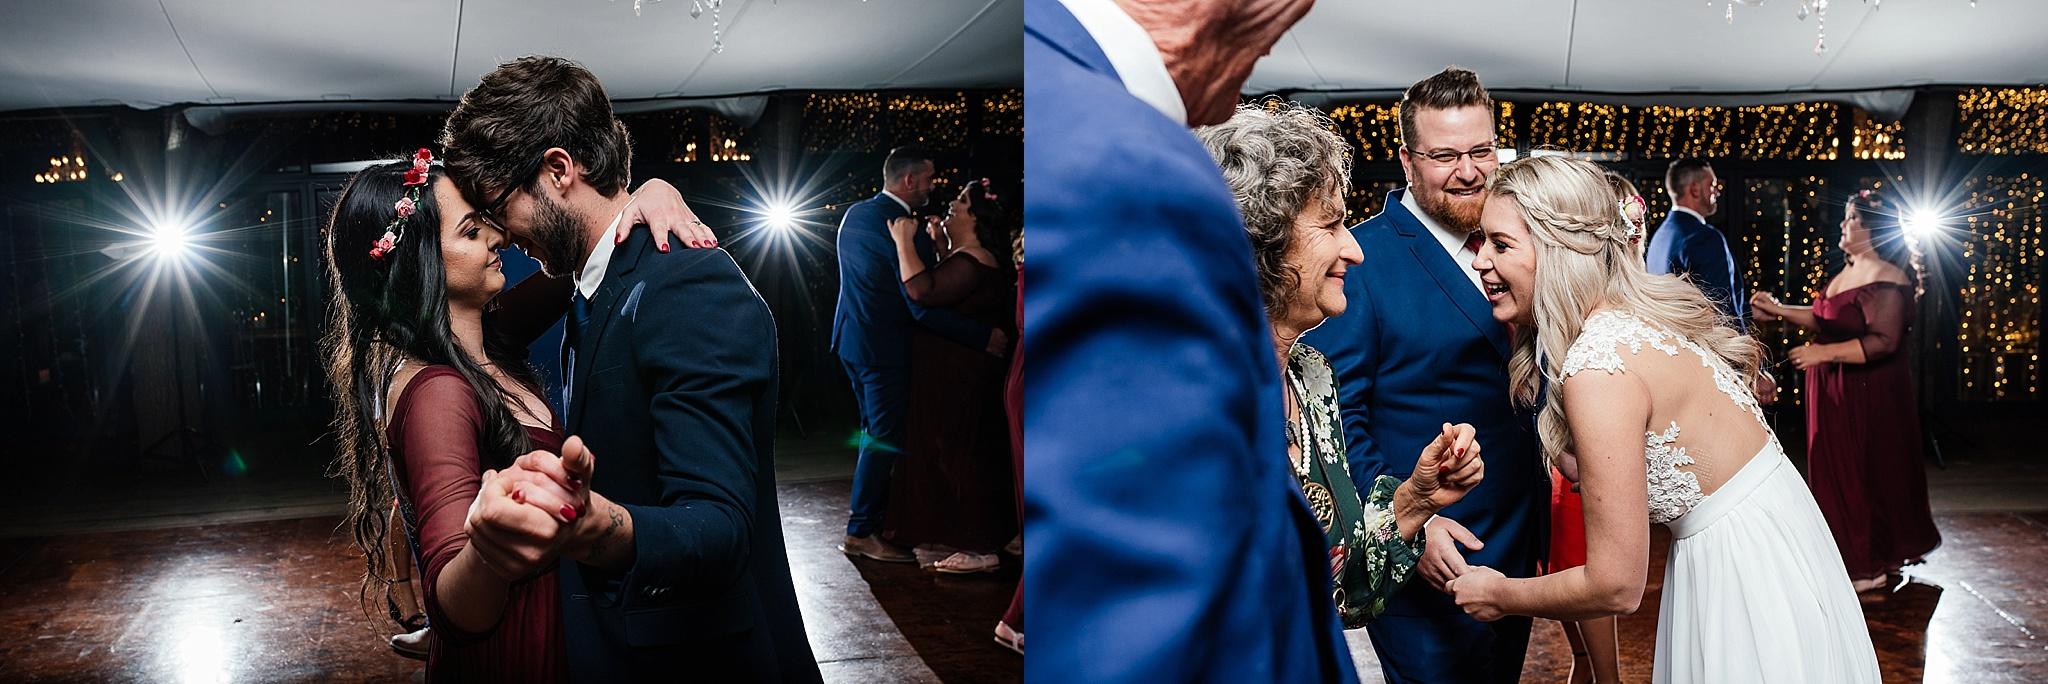 Cape Town Photographer Darren Bester - Die Woud Wedding - Gareth & Roxanne_0060.jpg